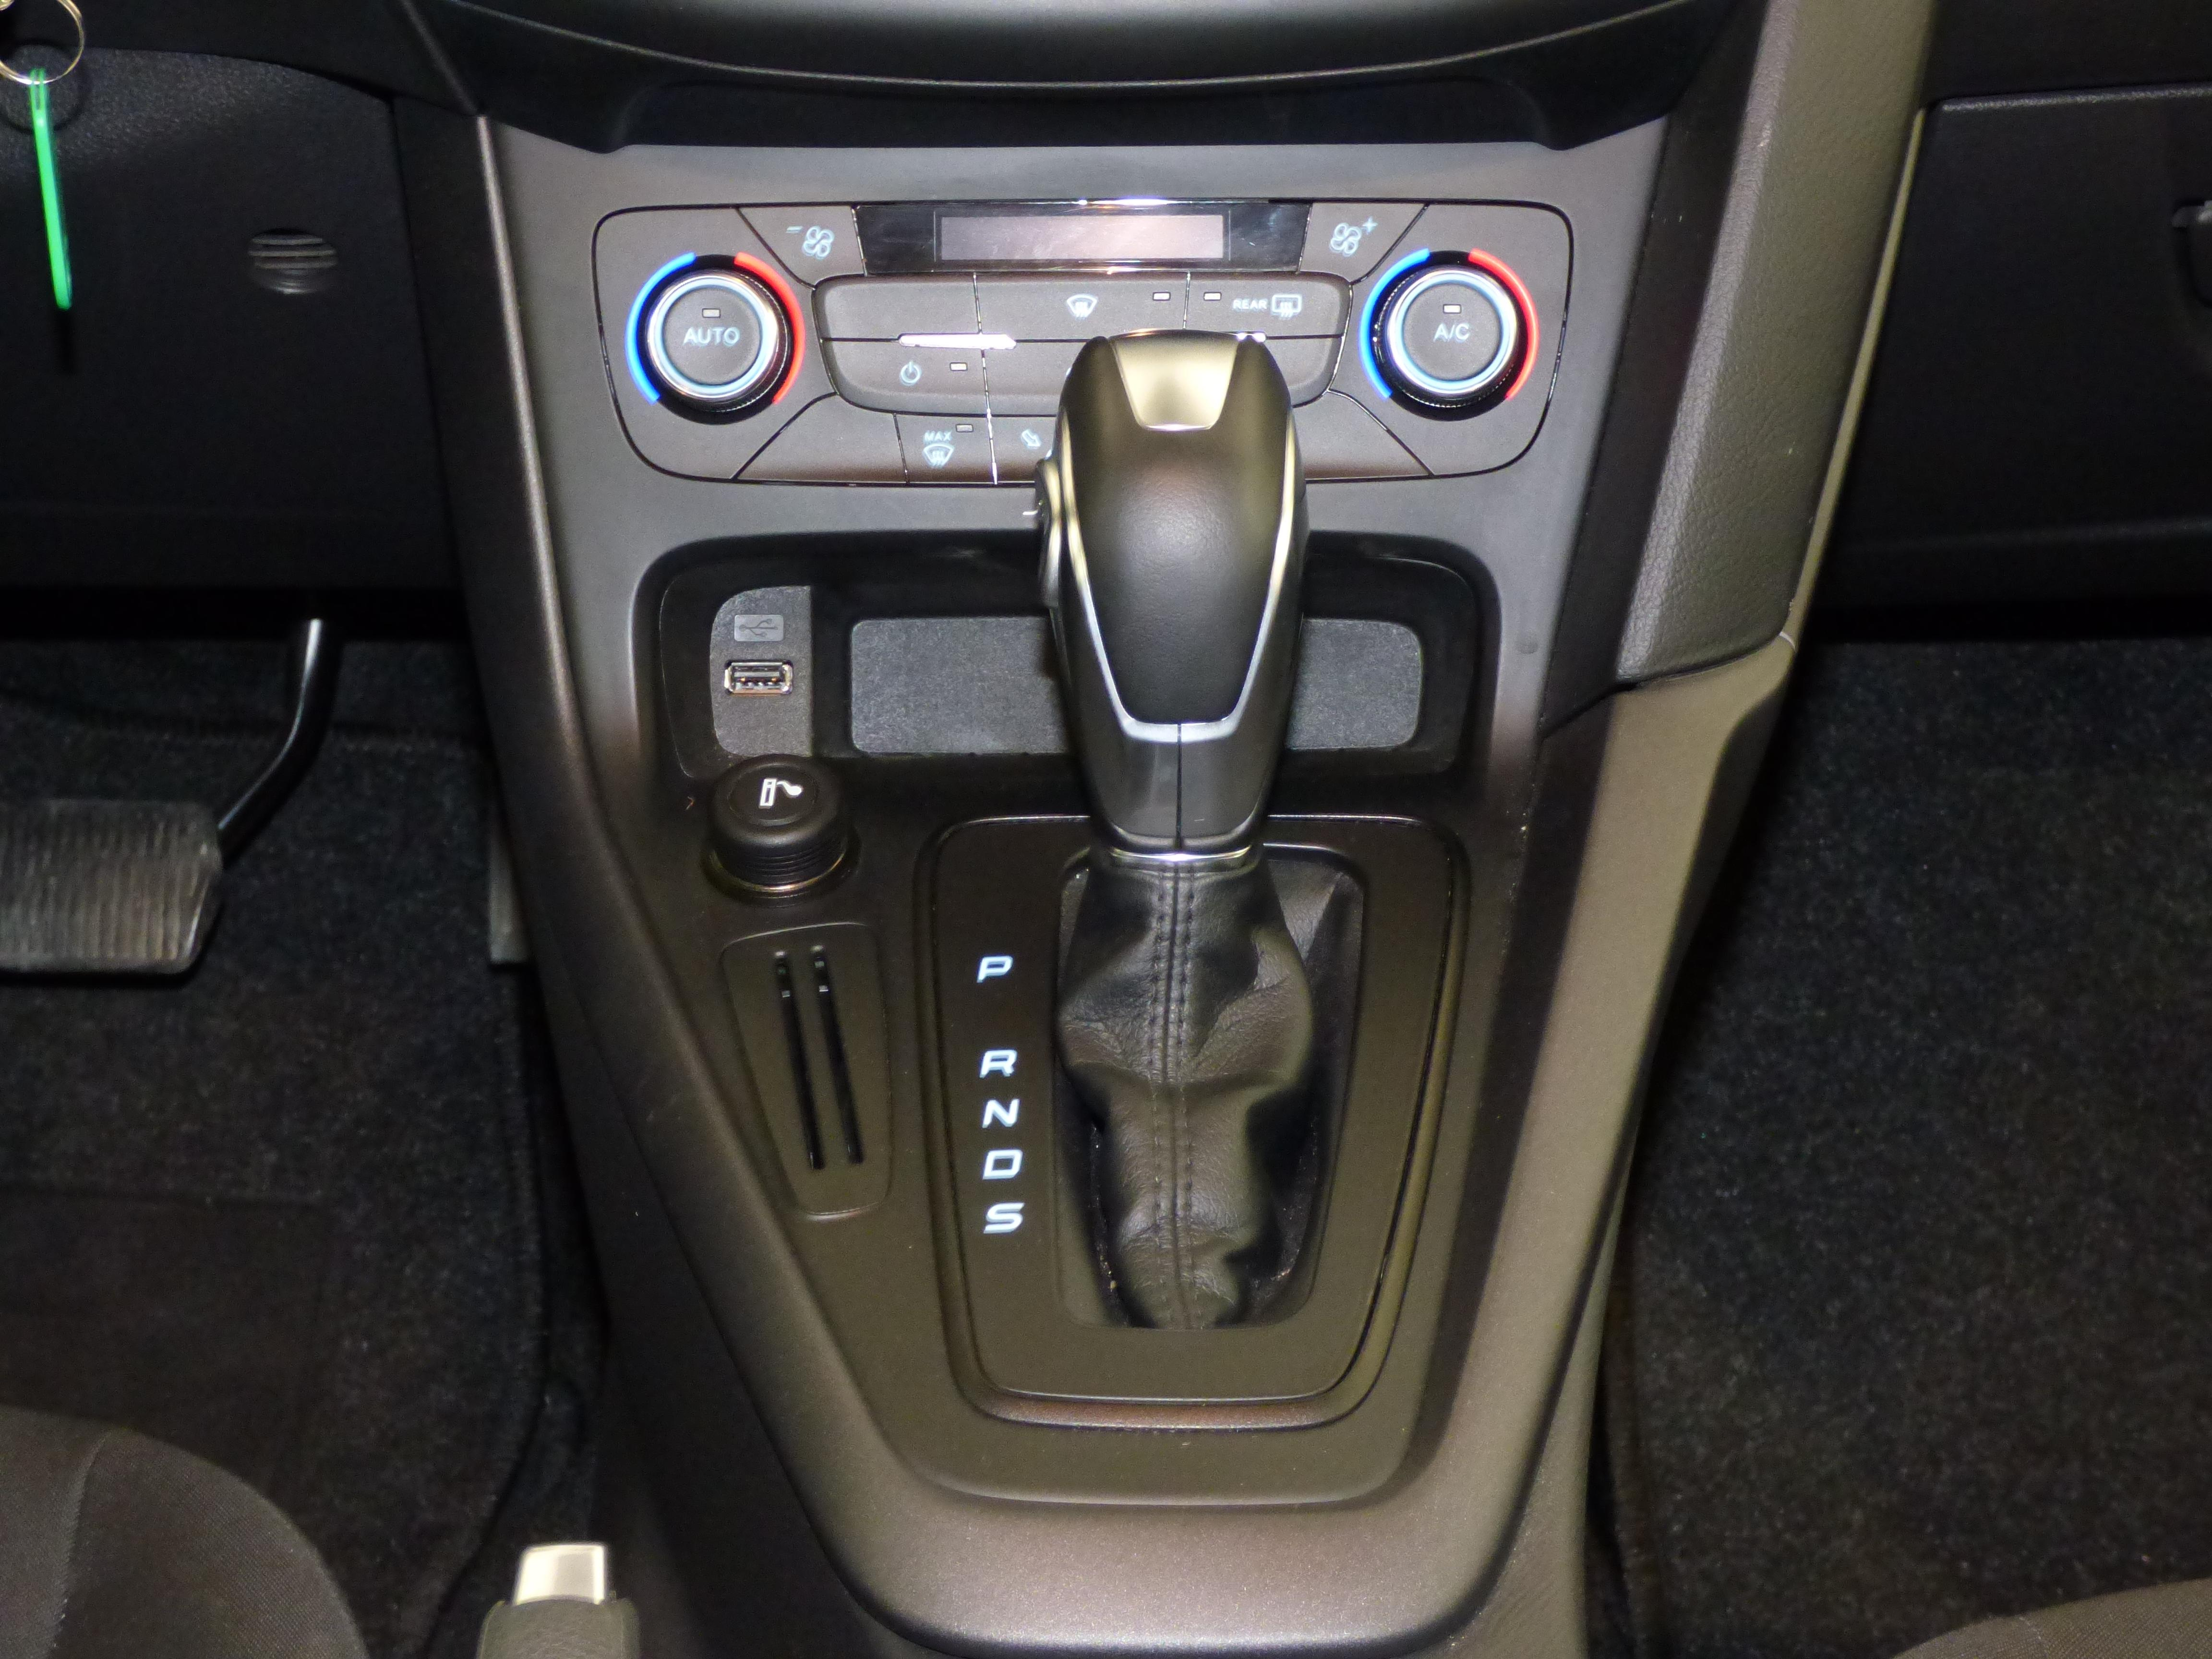 Focus Sportbreak 1.6 TIVCT 125CV Trend+ automatico 12